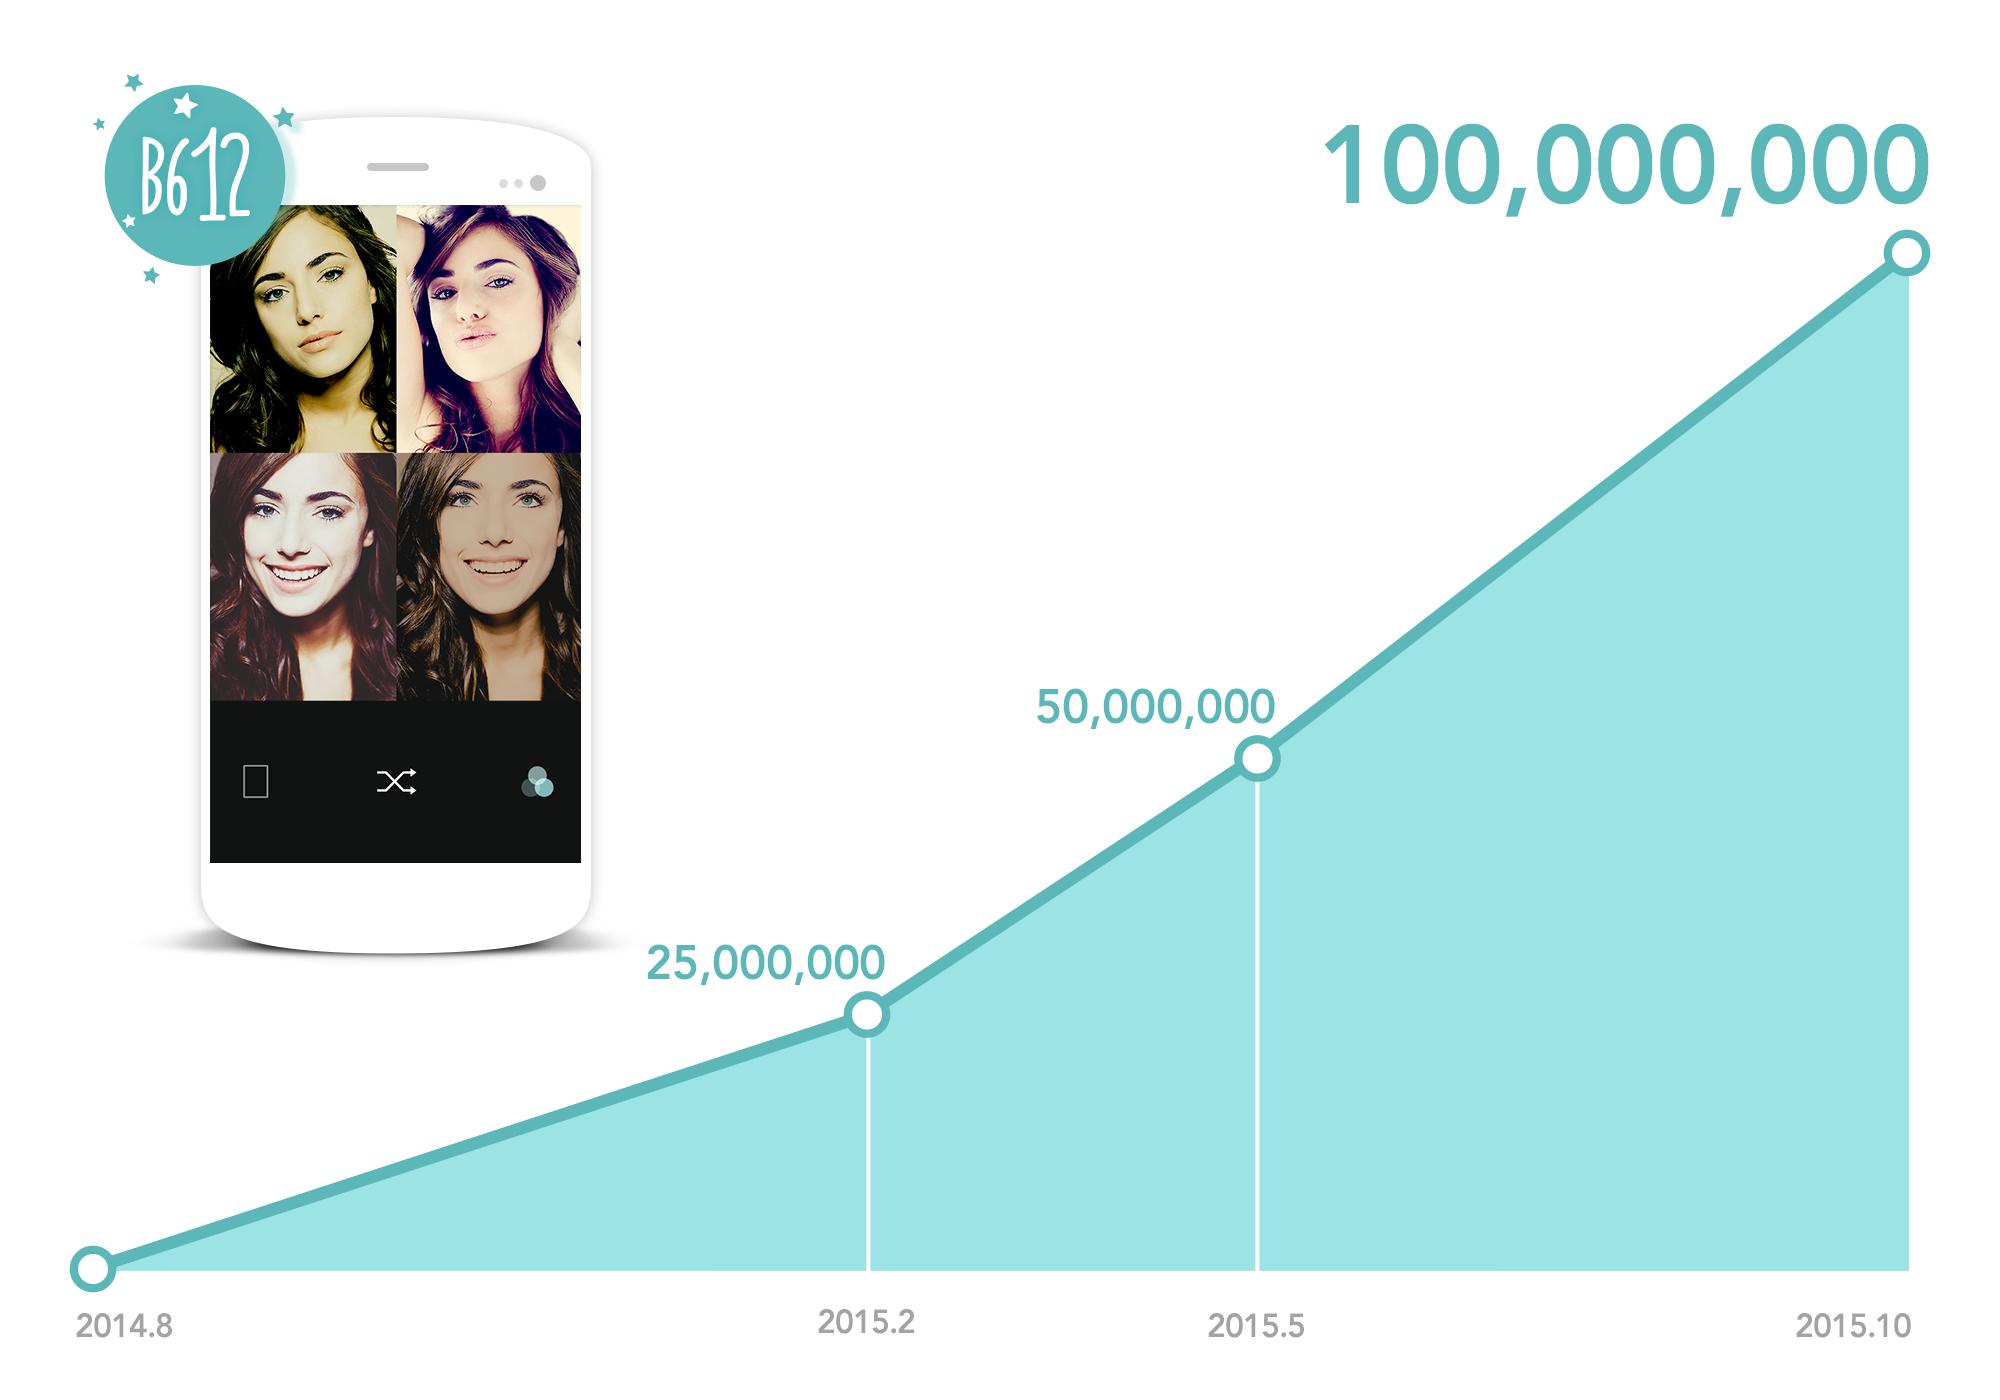 "B612】Dedicated ""Selfie"" Photo App B612 Tops 100 Million Downloads"